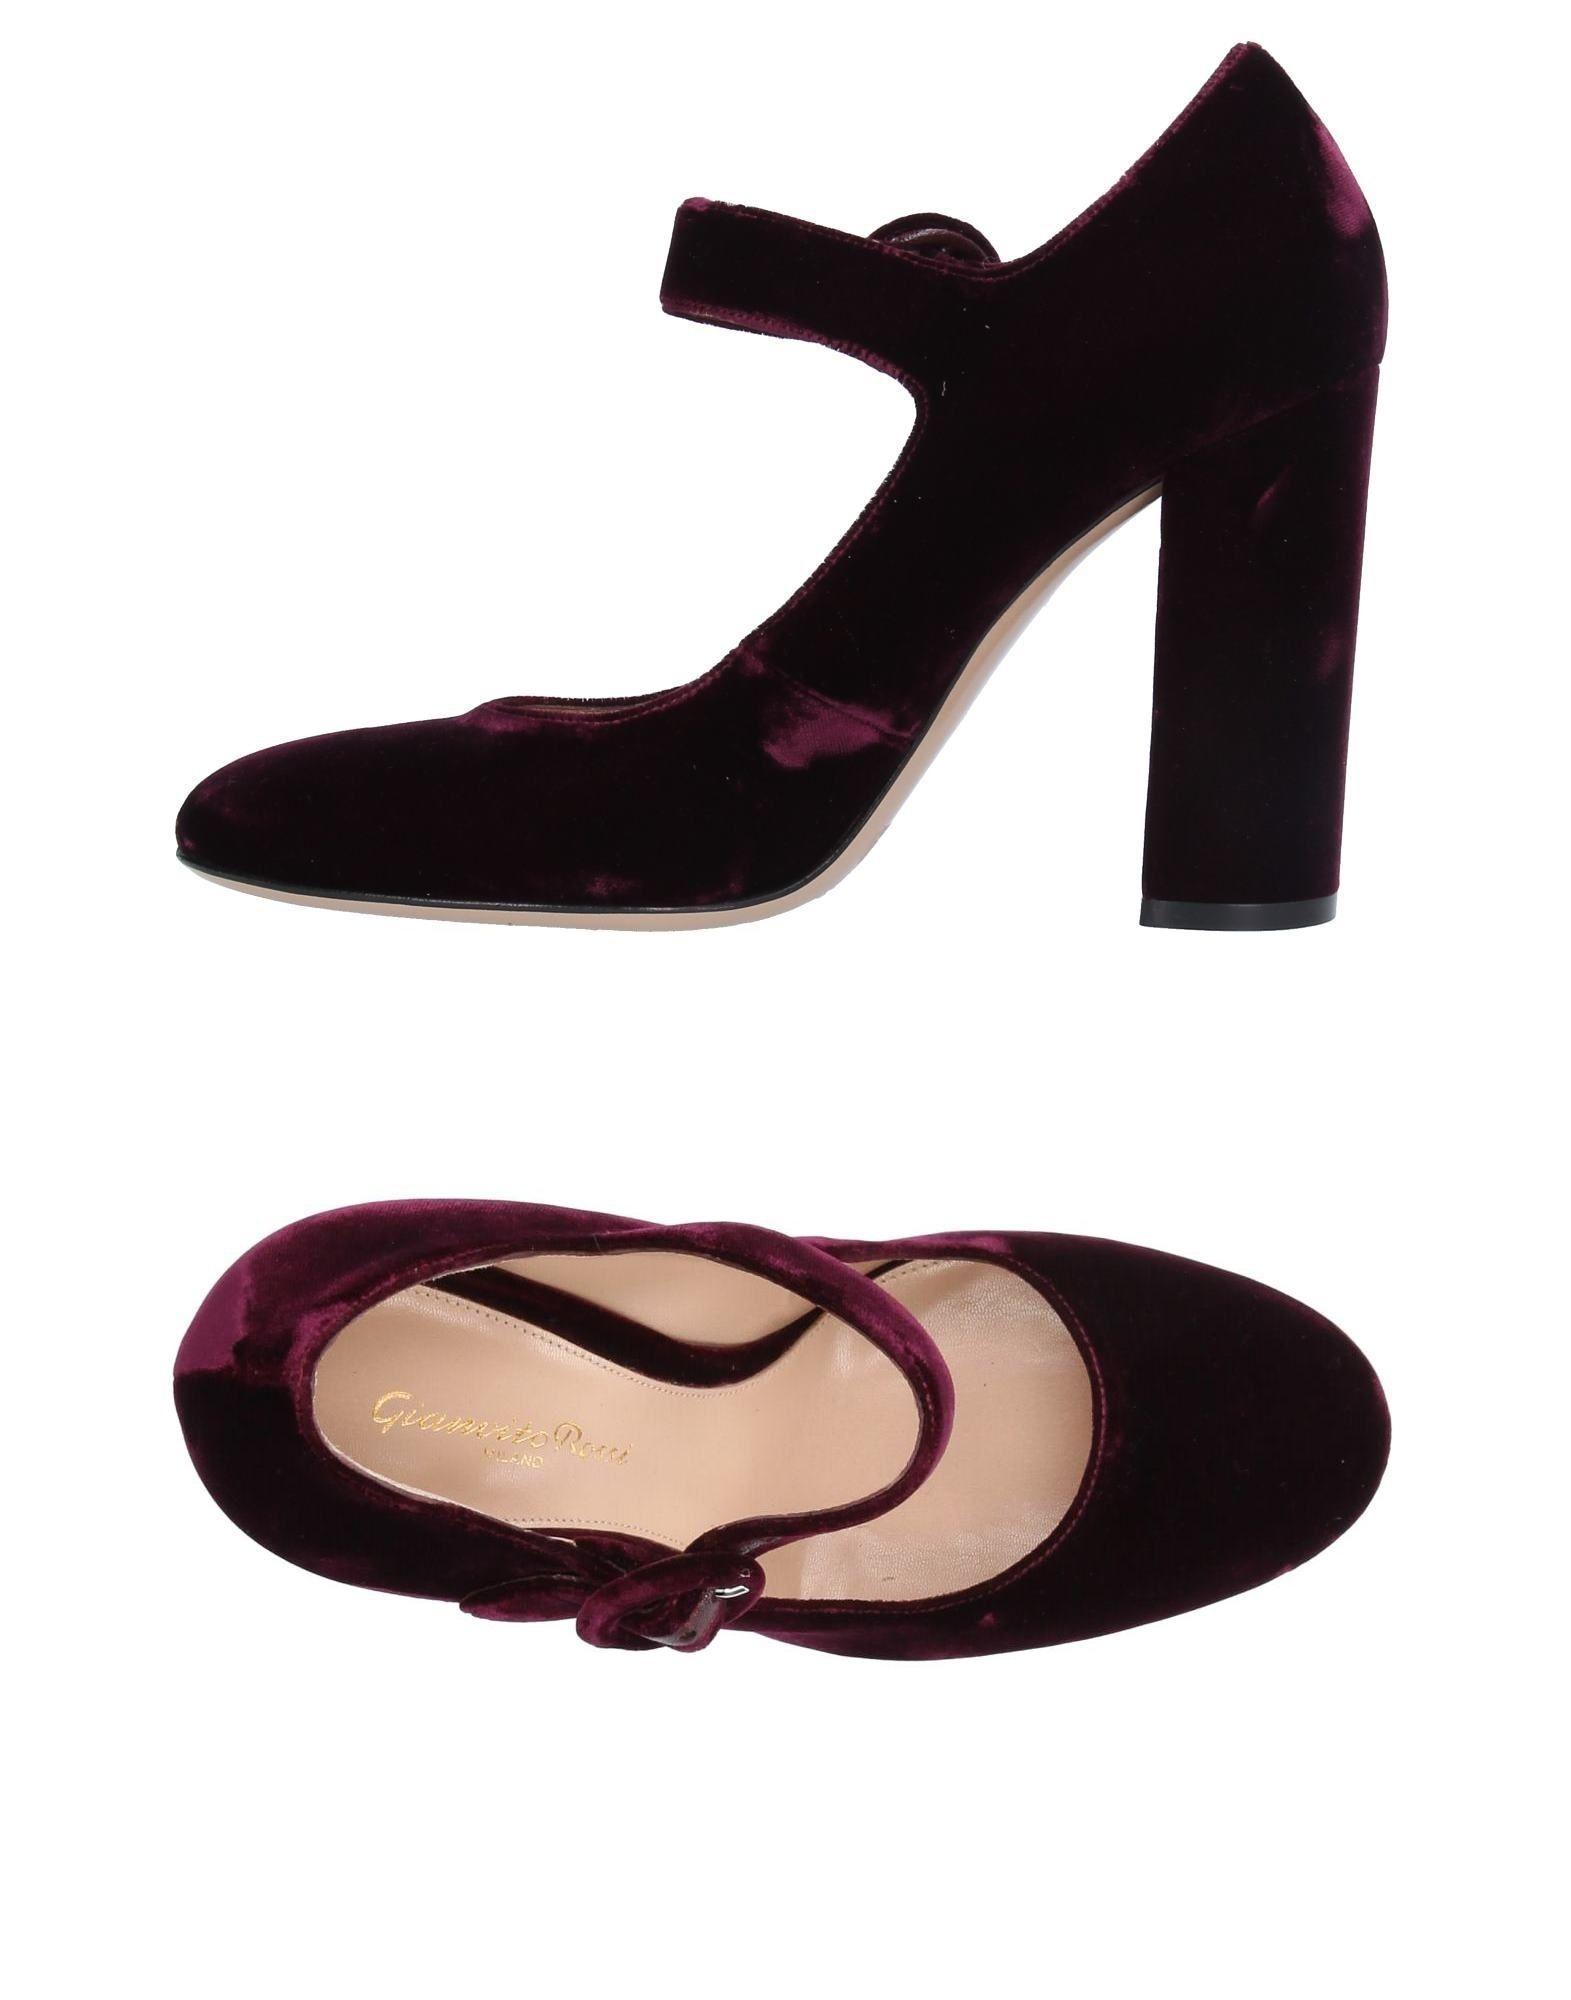 Rabatt Schuhe Gianvito Rossi Pumps Damen  11210992AB